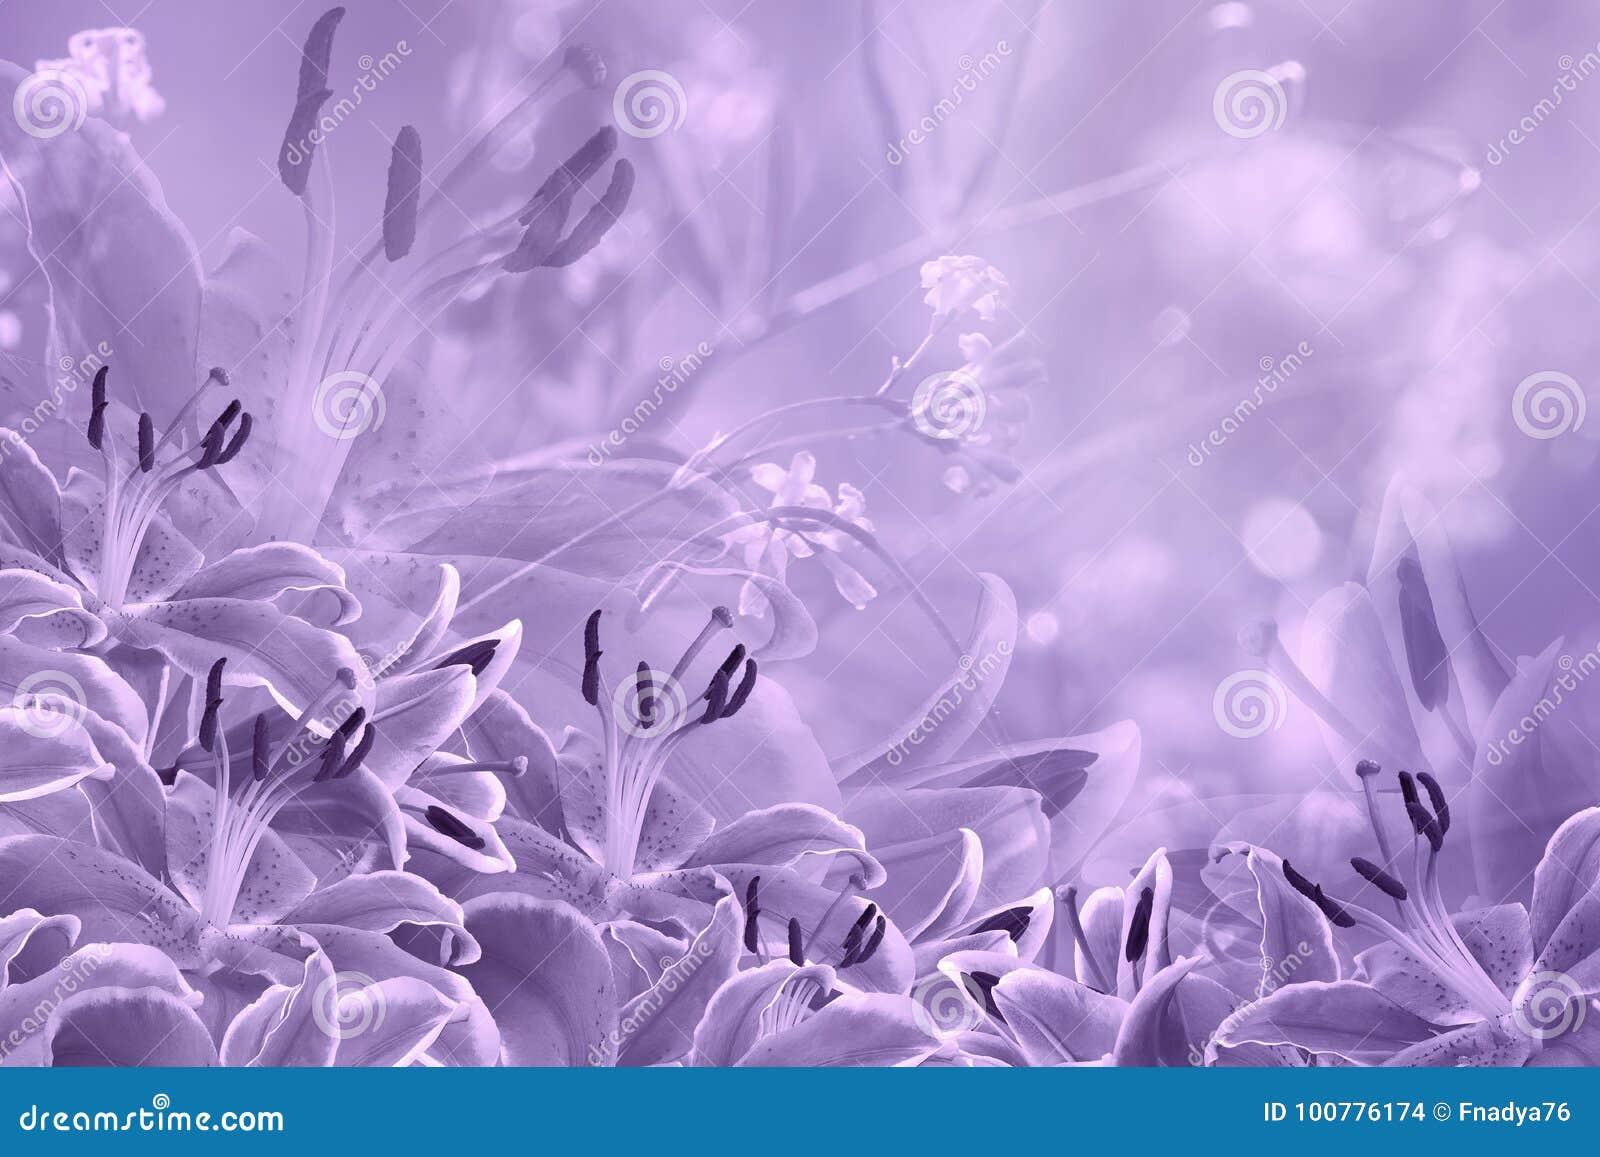 Floral Light Violet Beautiful Background Flower Composition Of